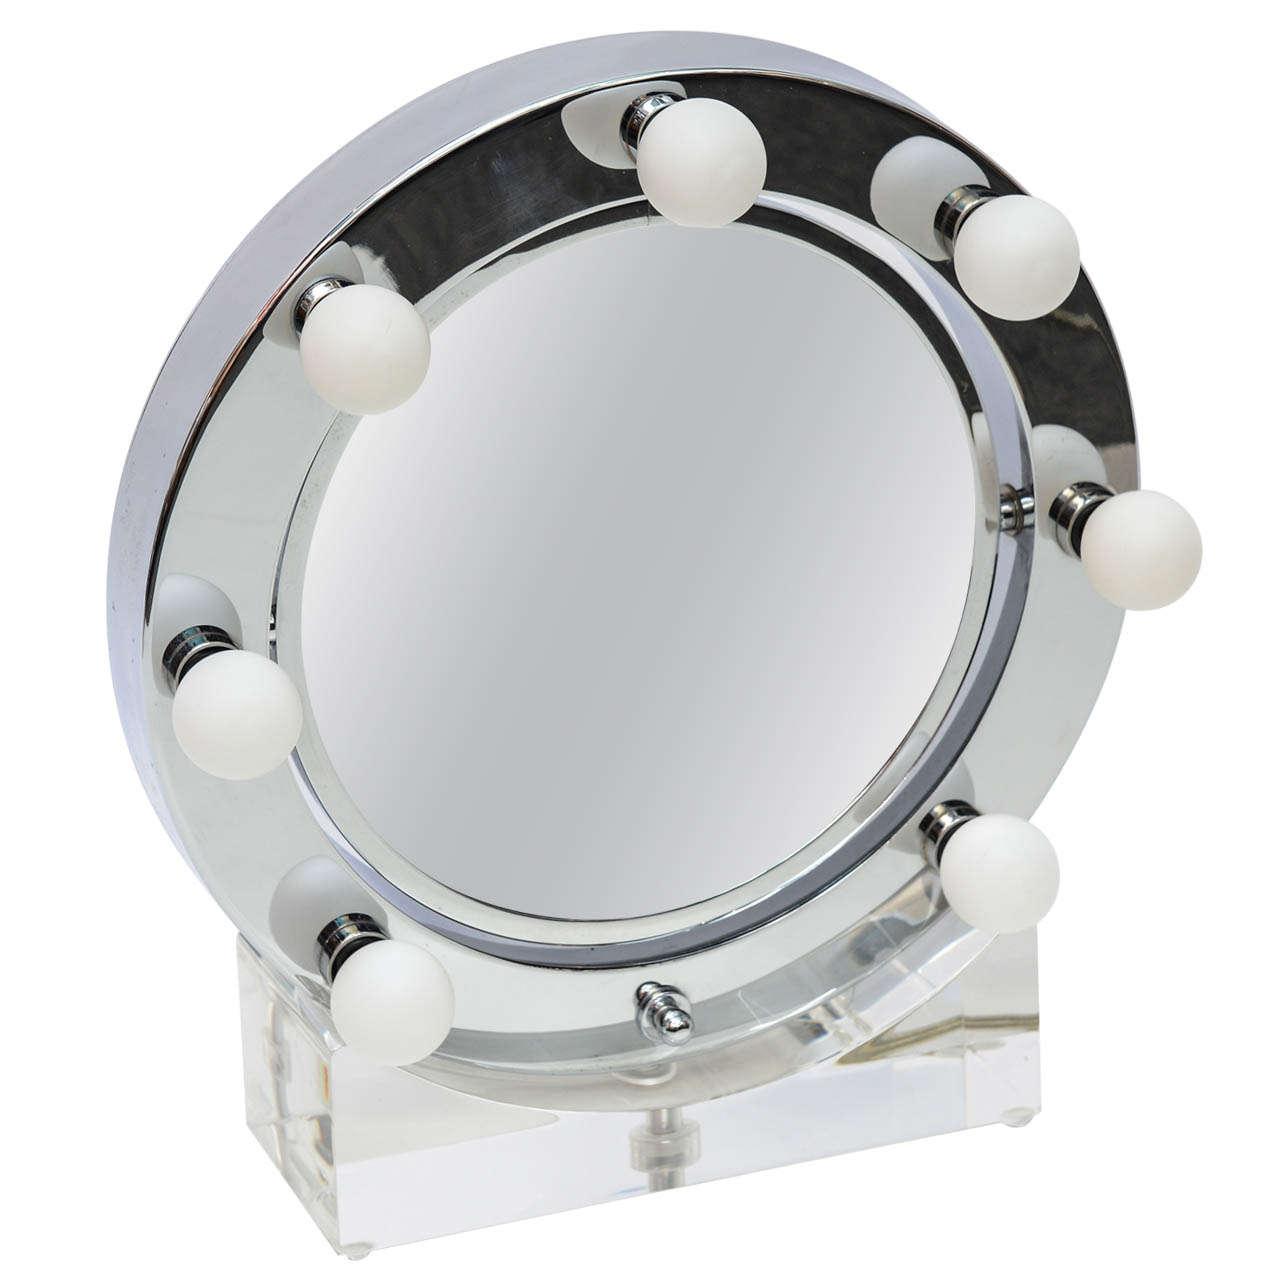 1970s Round Chrome And Lucite Vanity Mirror